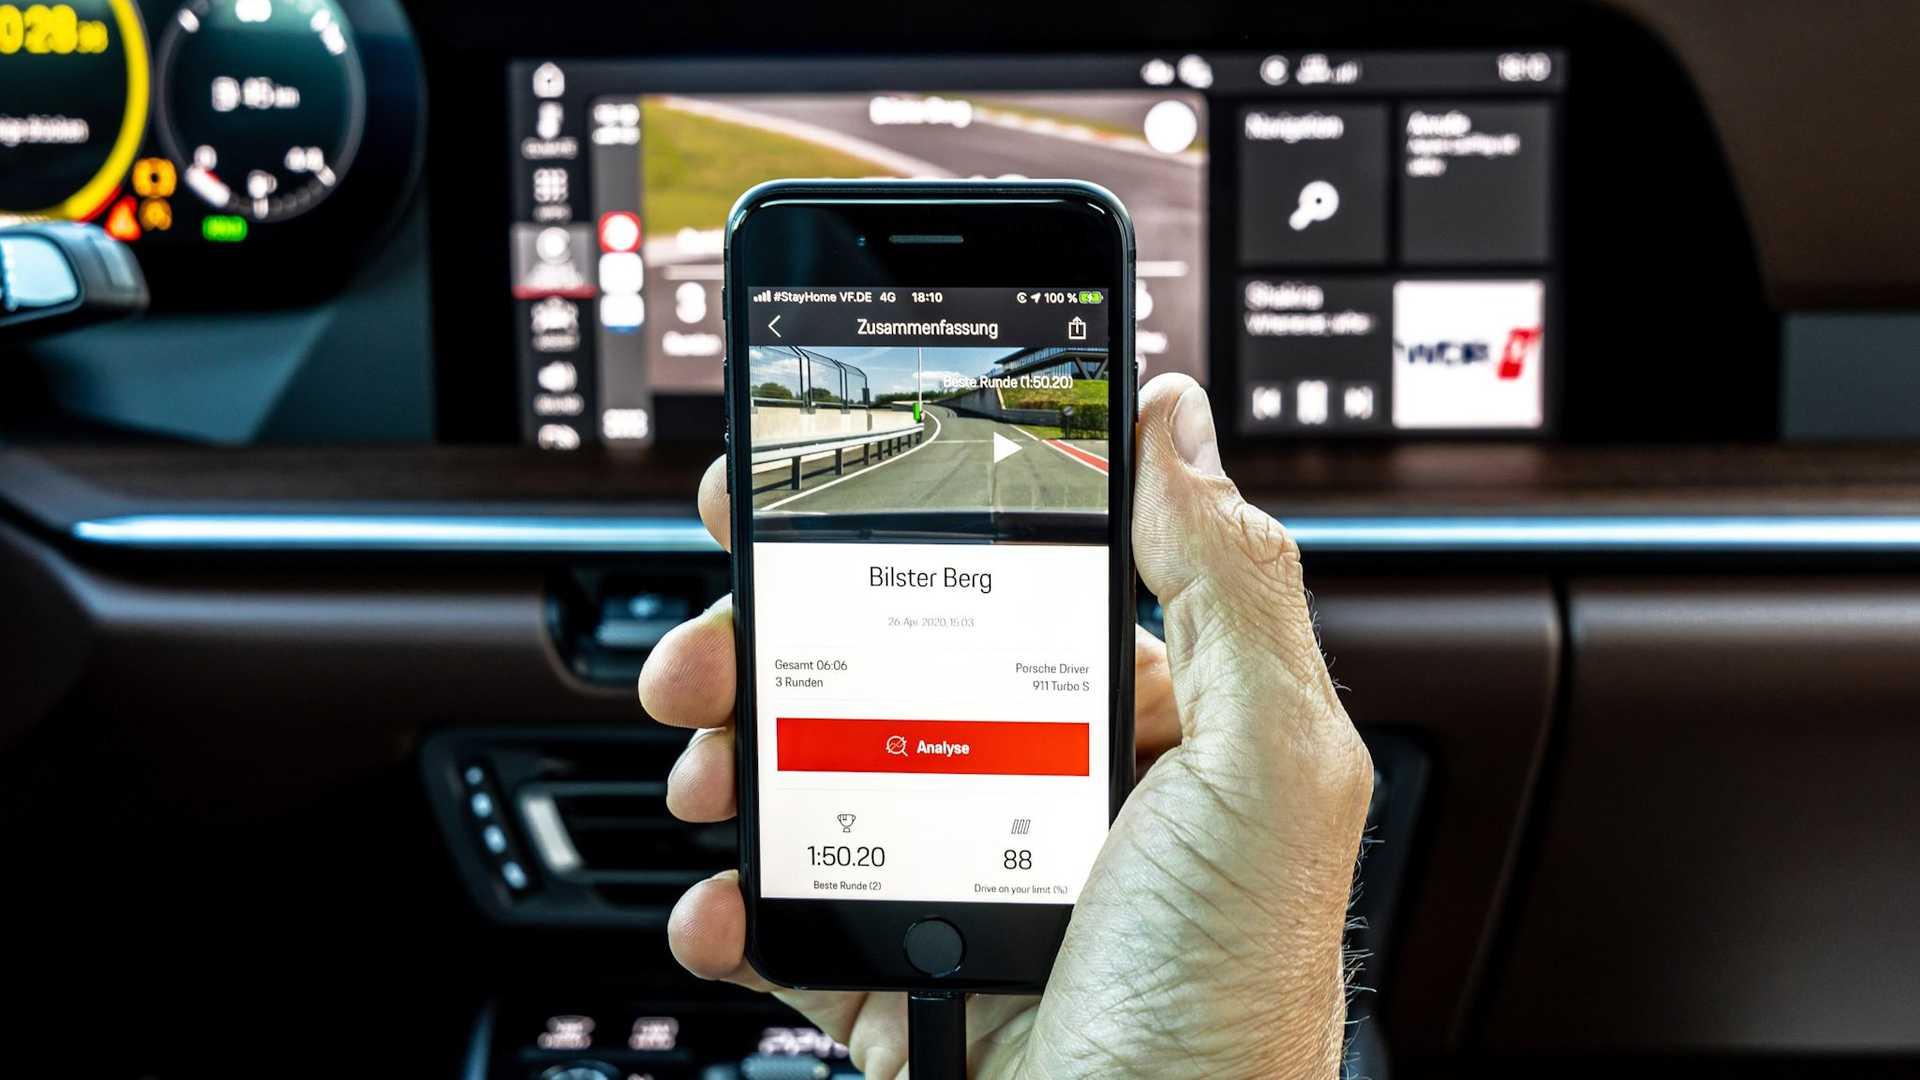 Porsche-Communication-Management-6-26